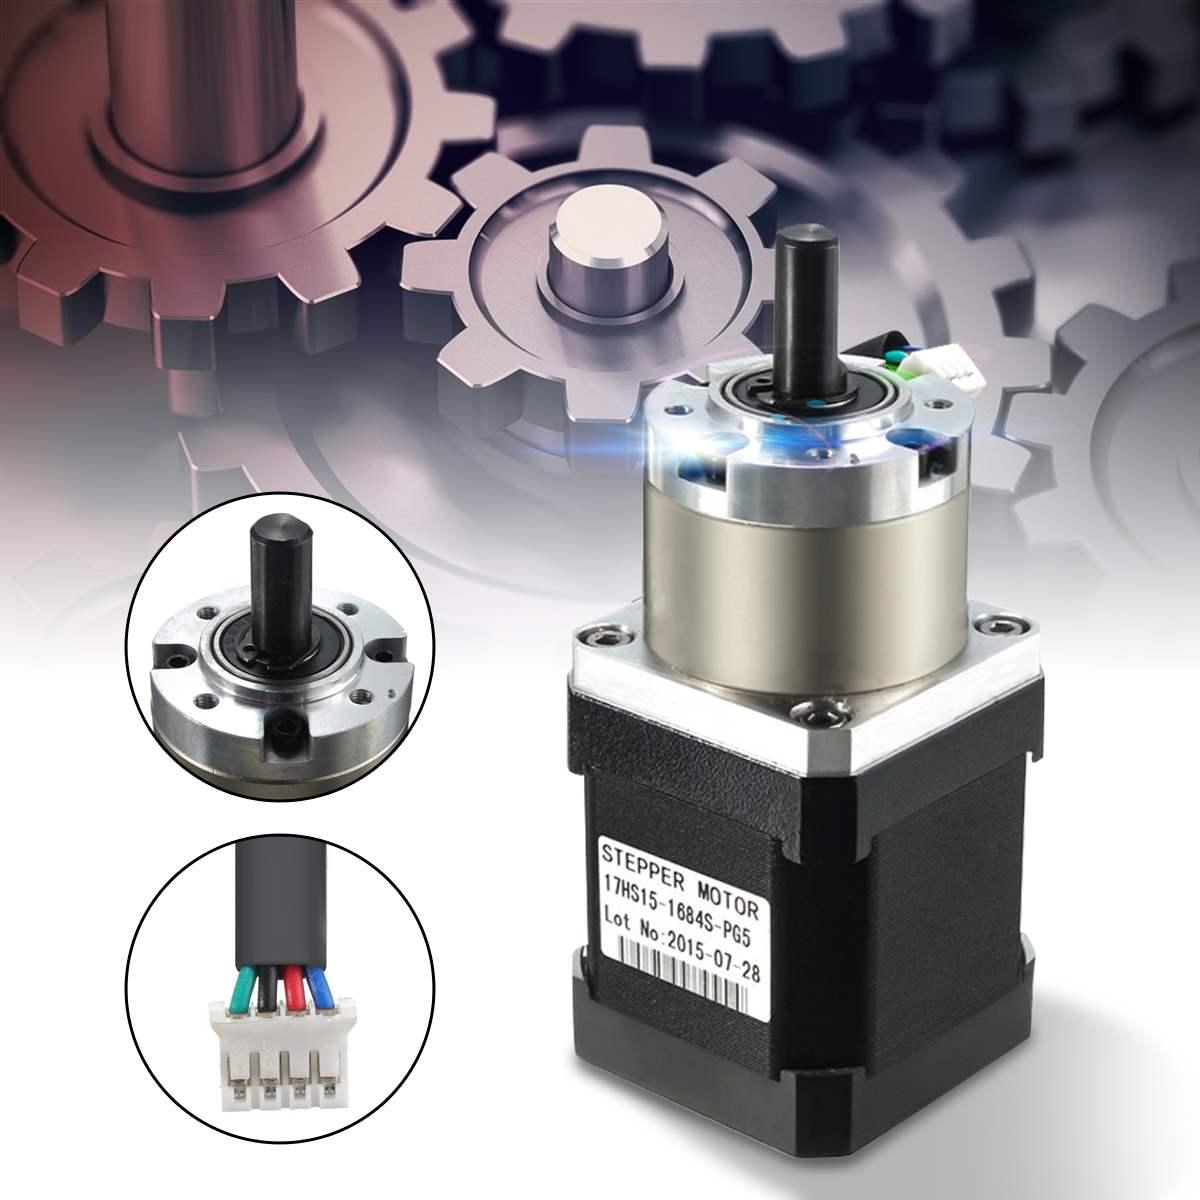 Nema17 Stepper Motor 42 motor Extruder Gear Stepper Motor Ratio 5.18:1 Planetary Gearbox Nema 17 Step Motor